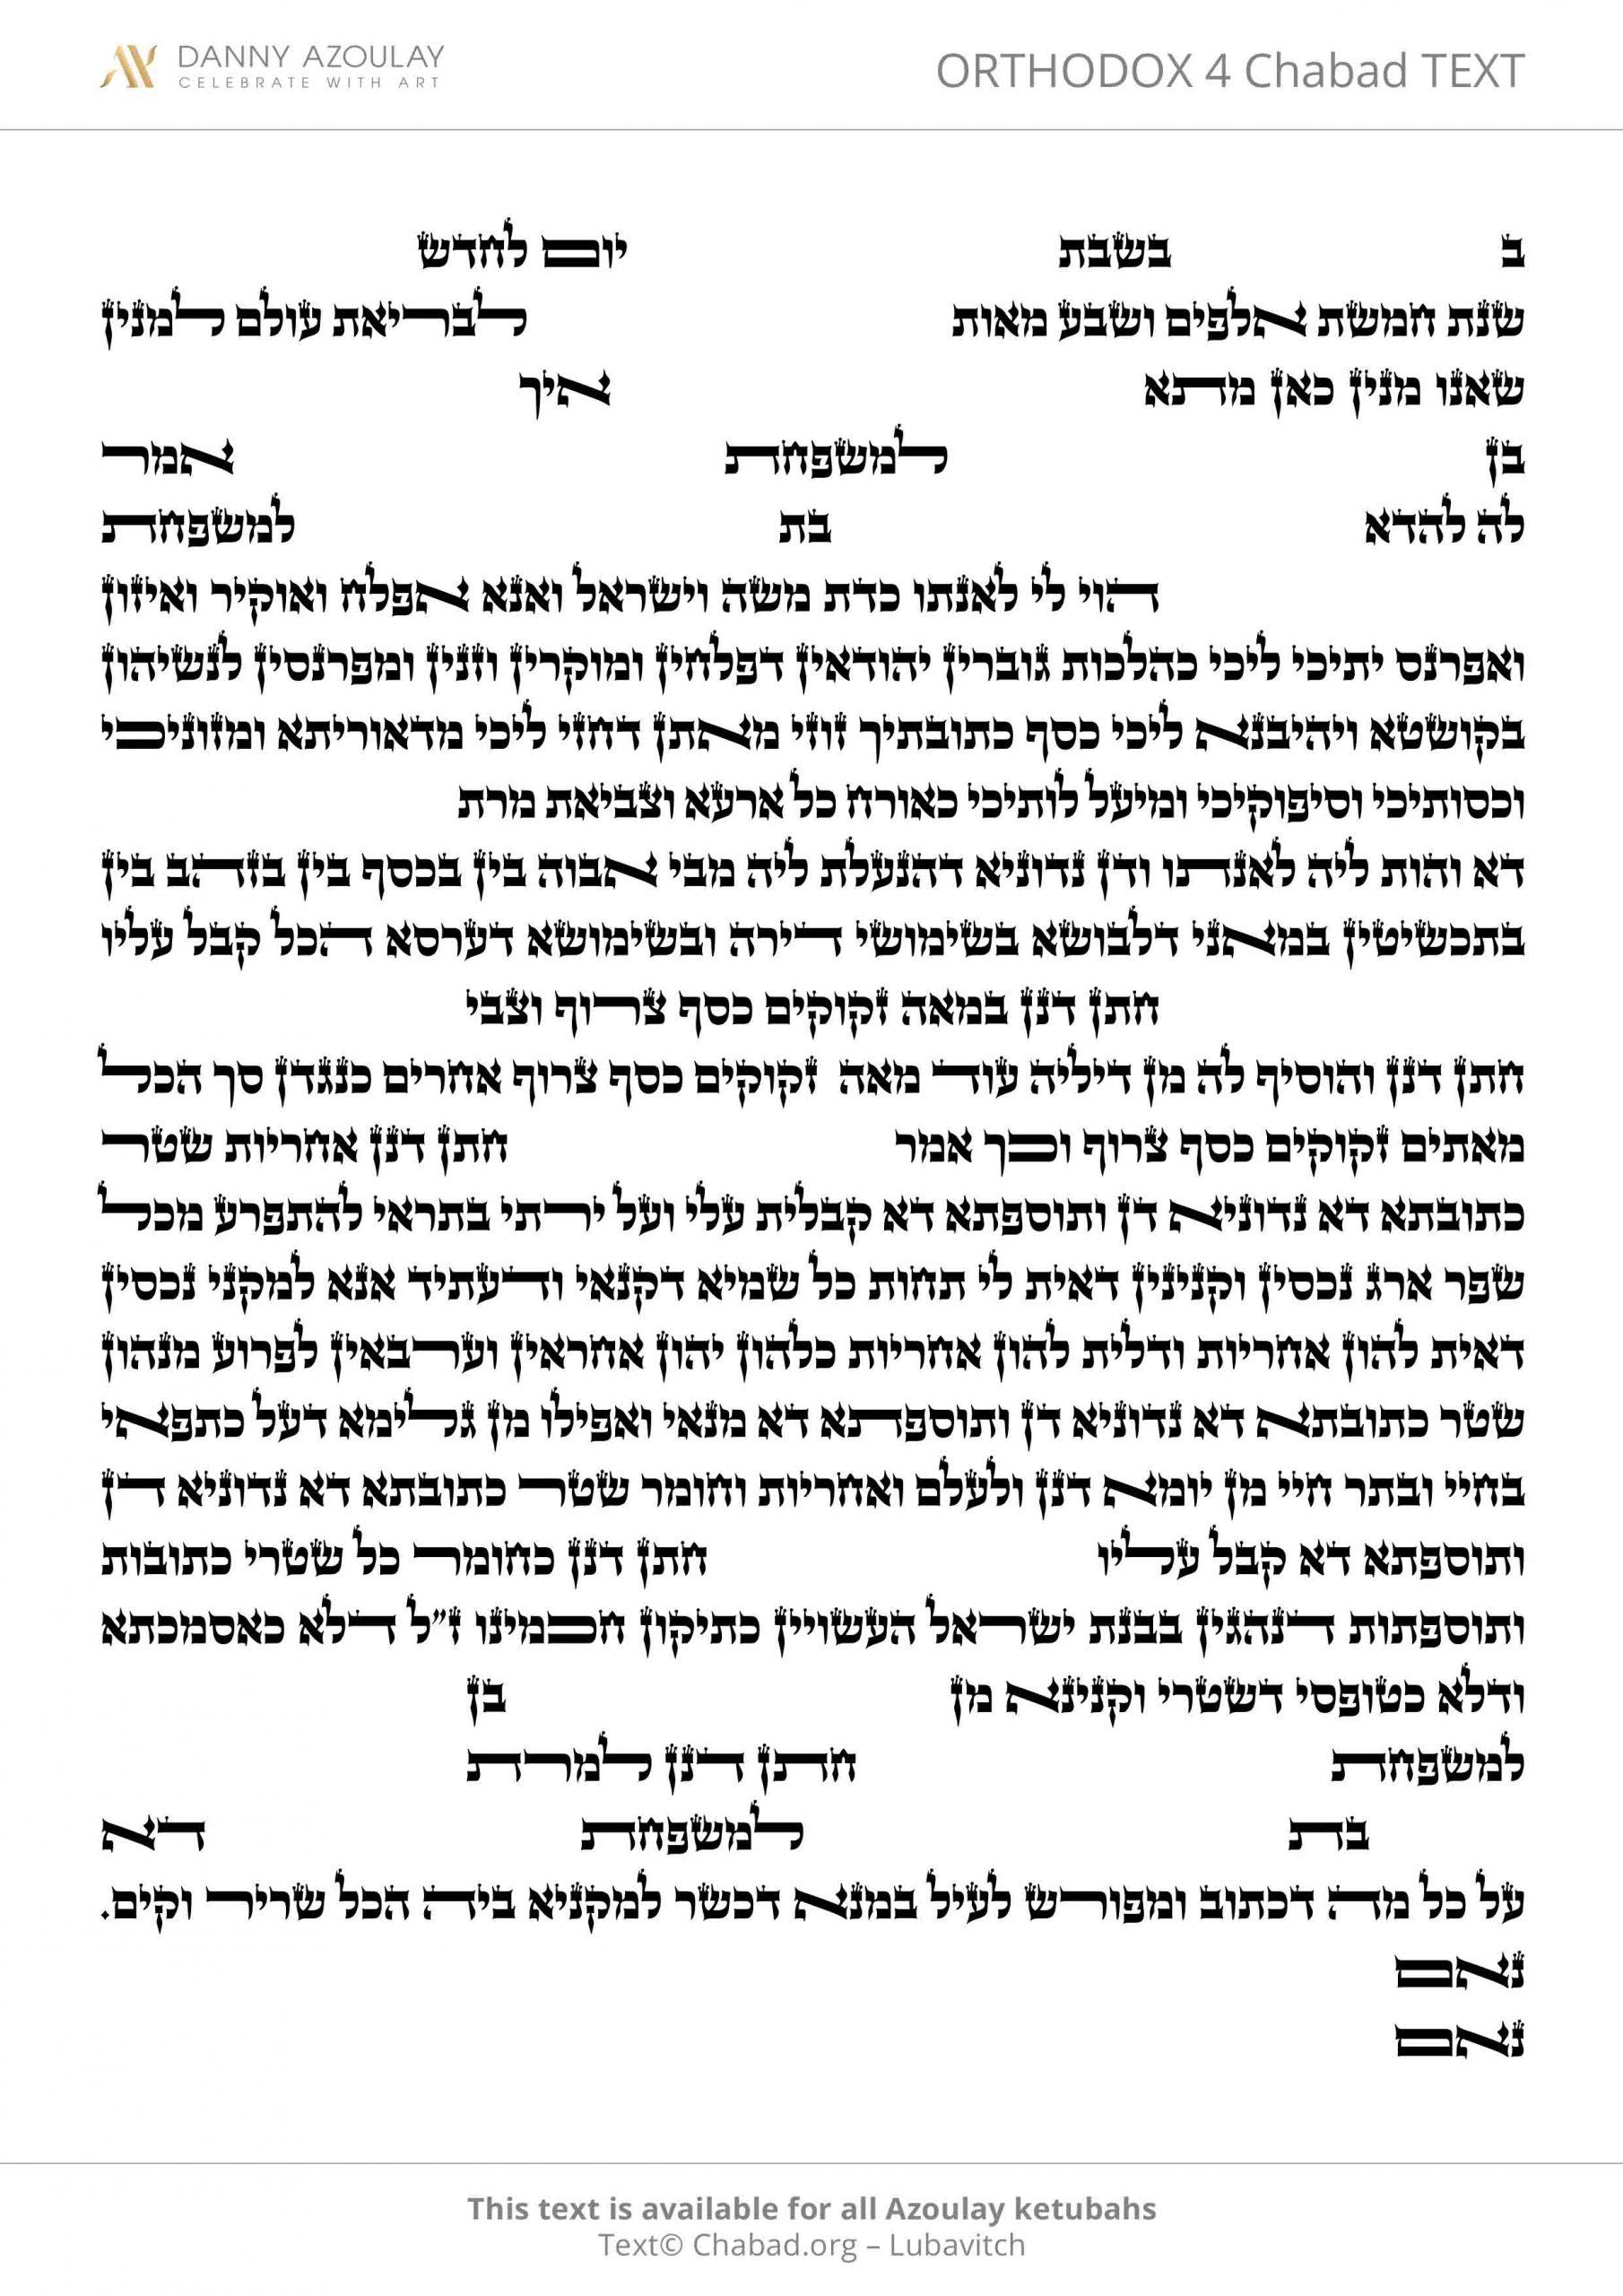 Orthodox Text 4